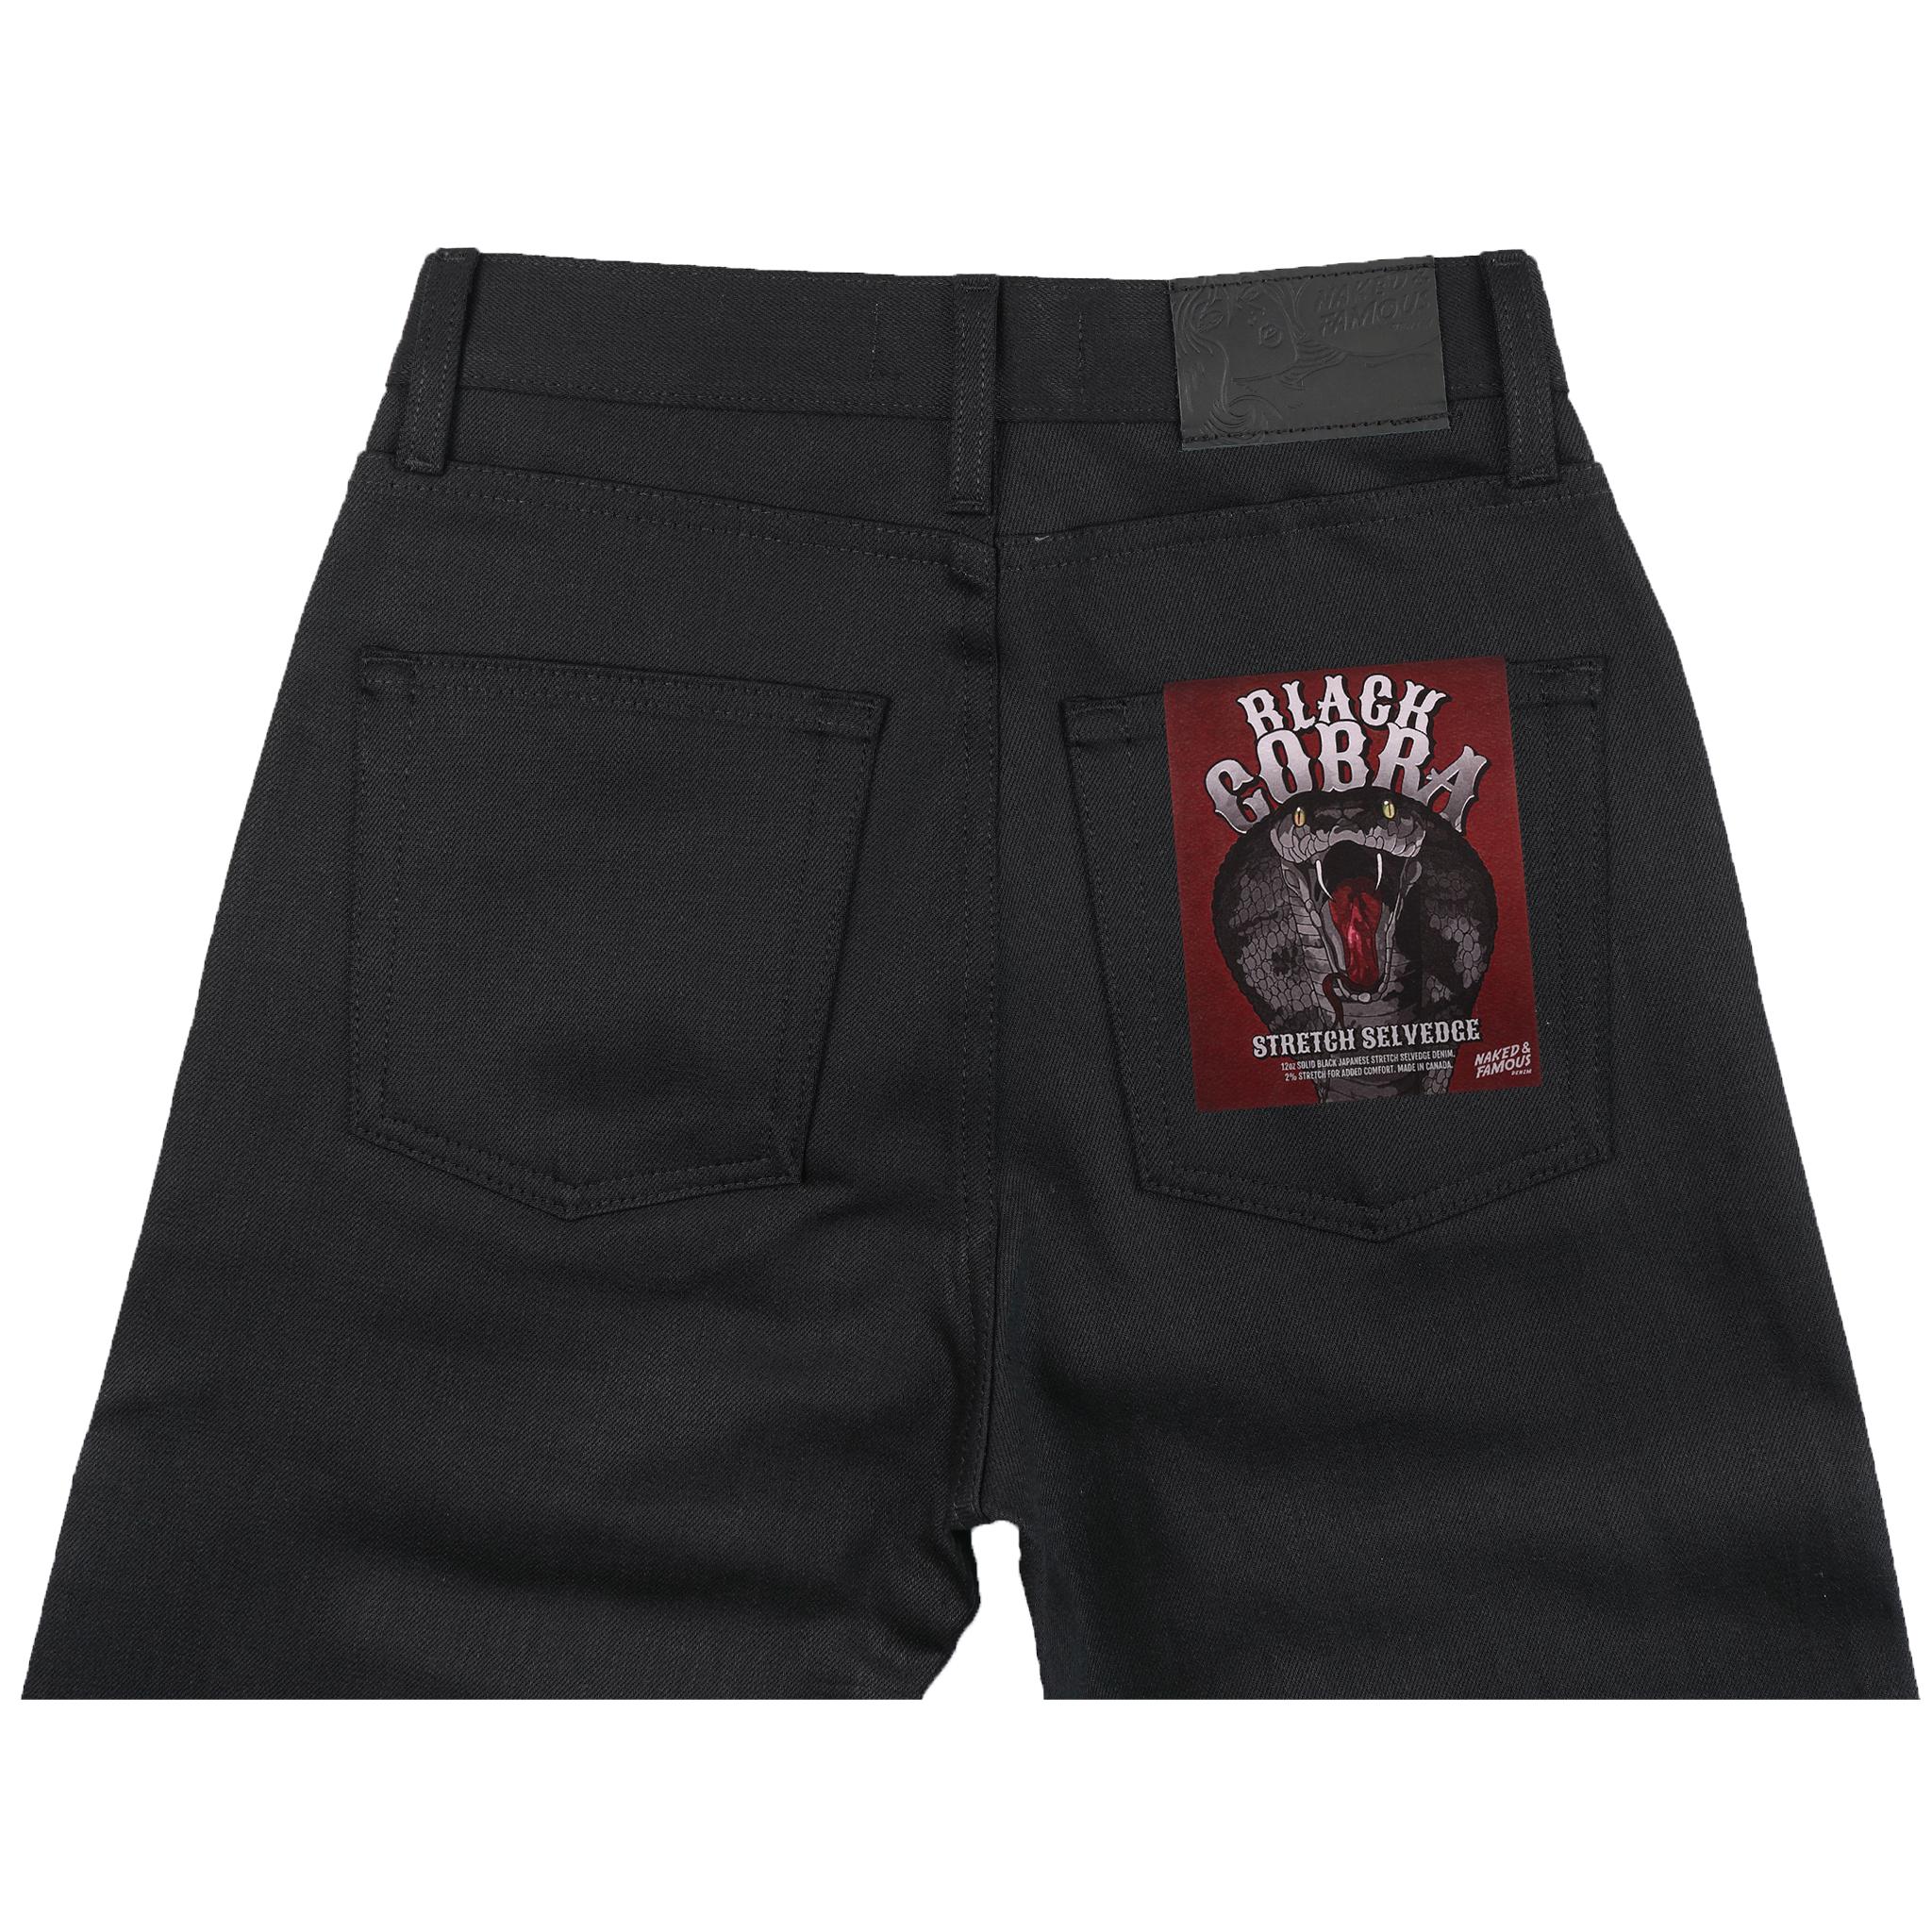 Women's Black Cobra jeans back view